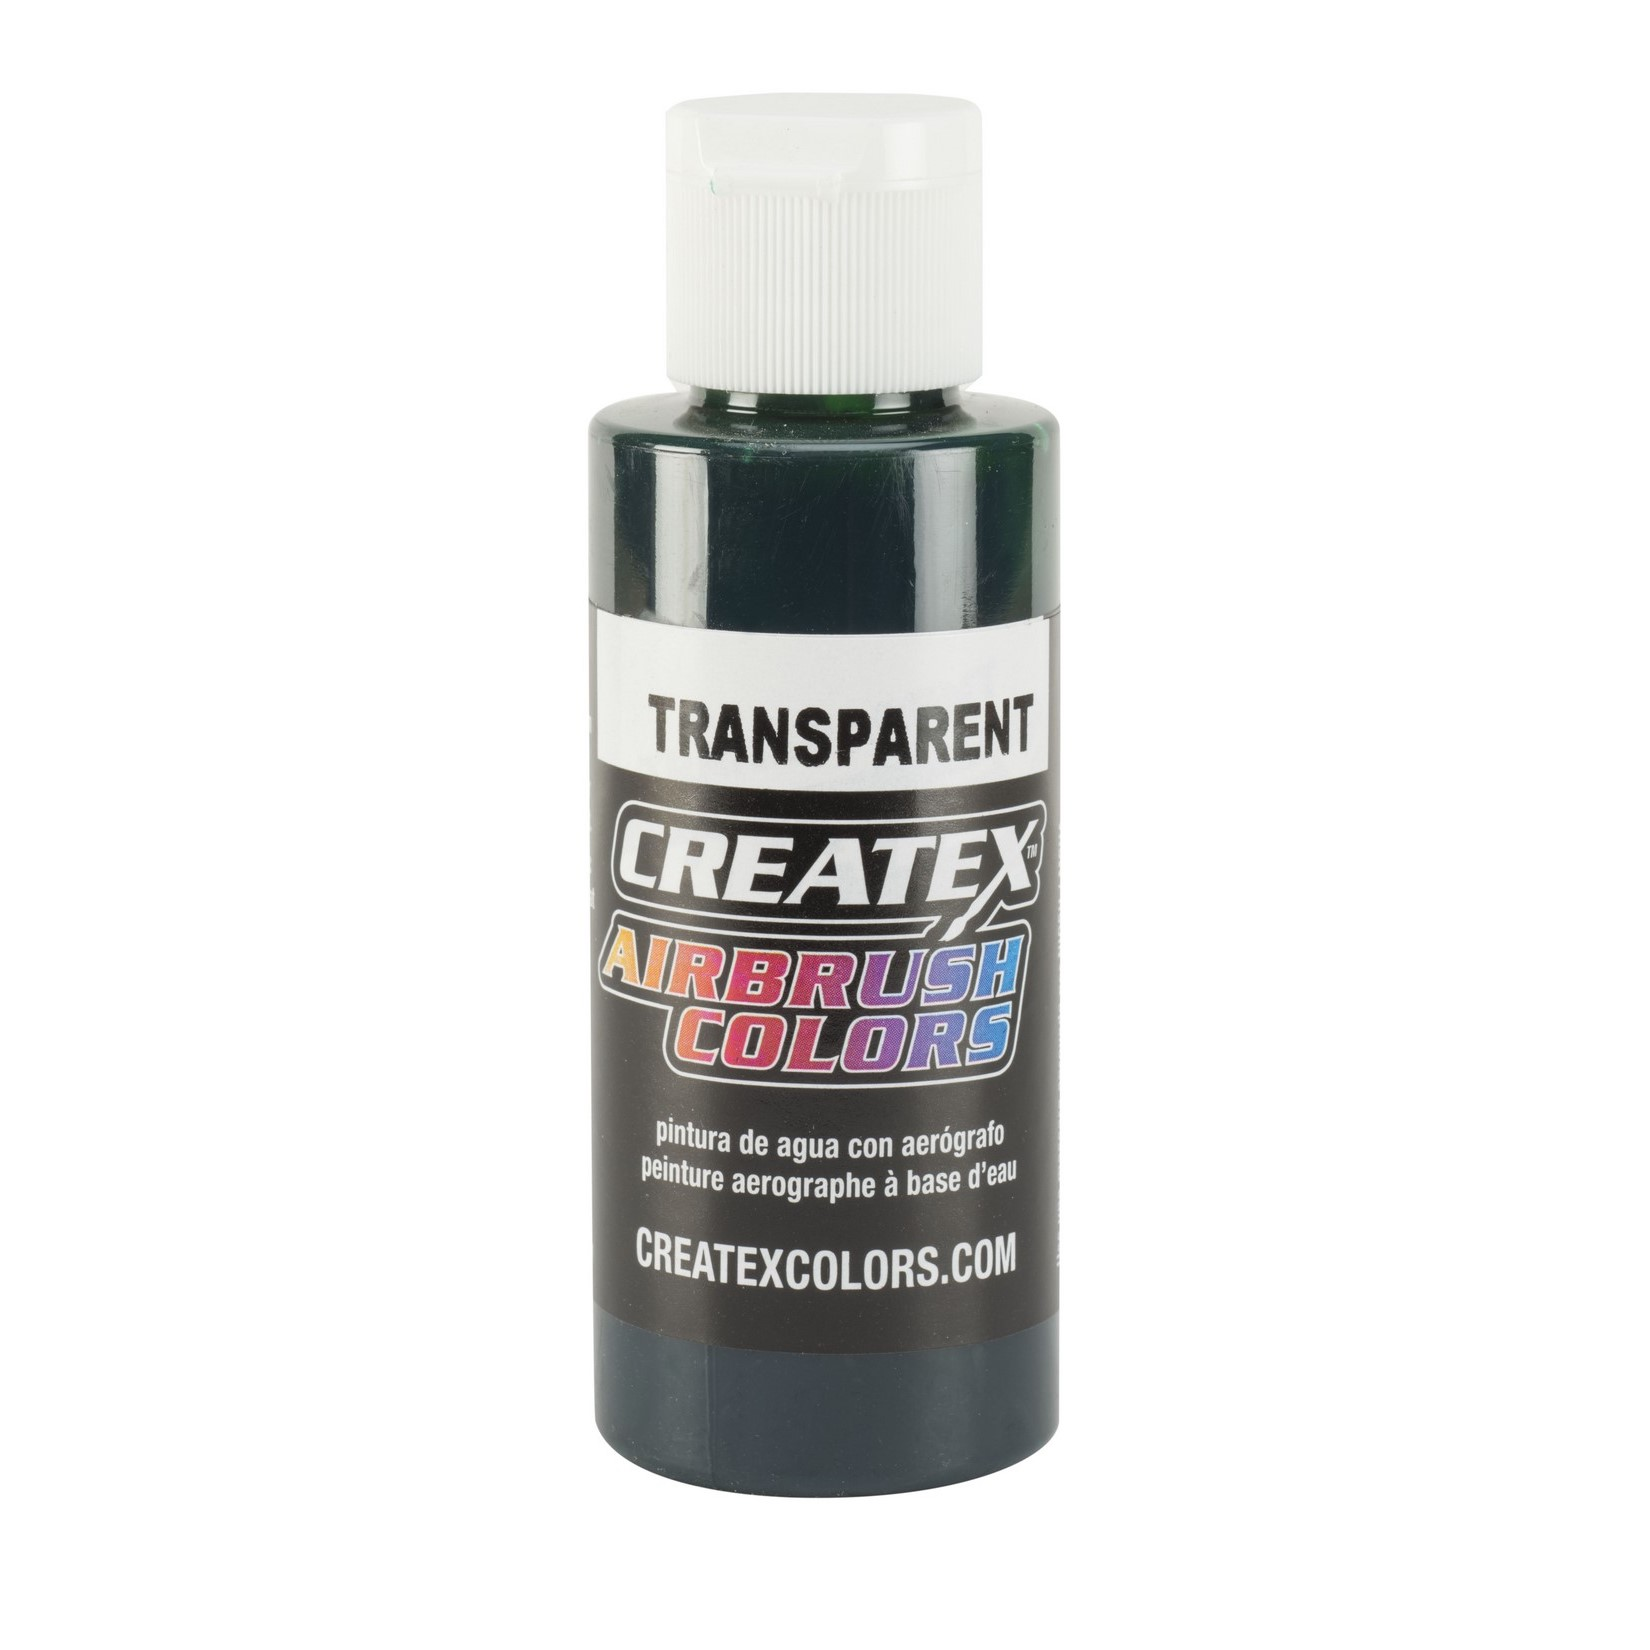 phthalo green Createx Airbrush Colors Farbe 60ml 11 5110 Createx Airbrushfarbe